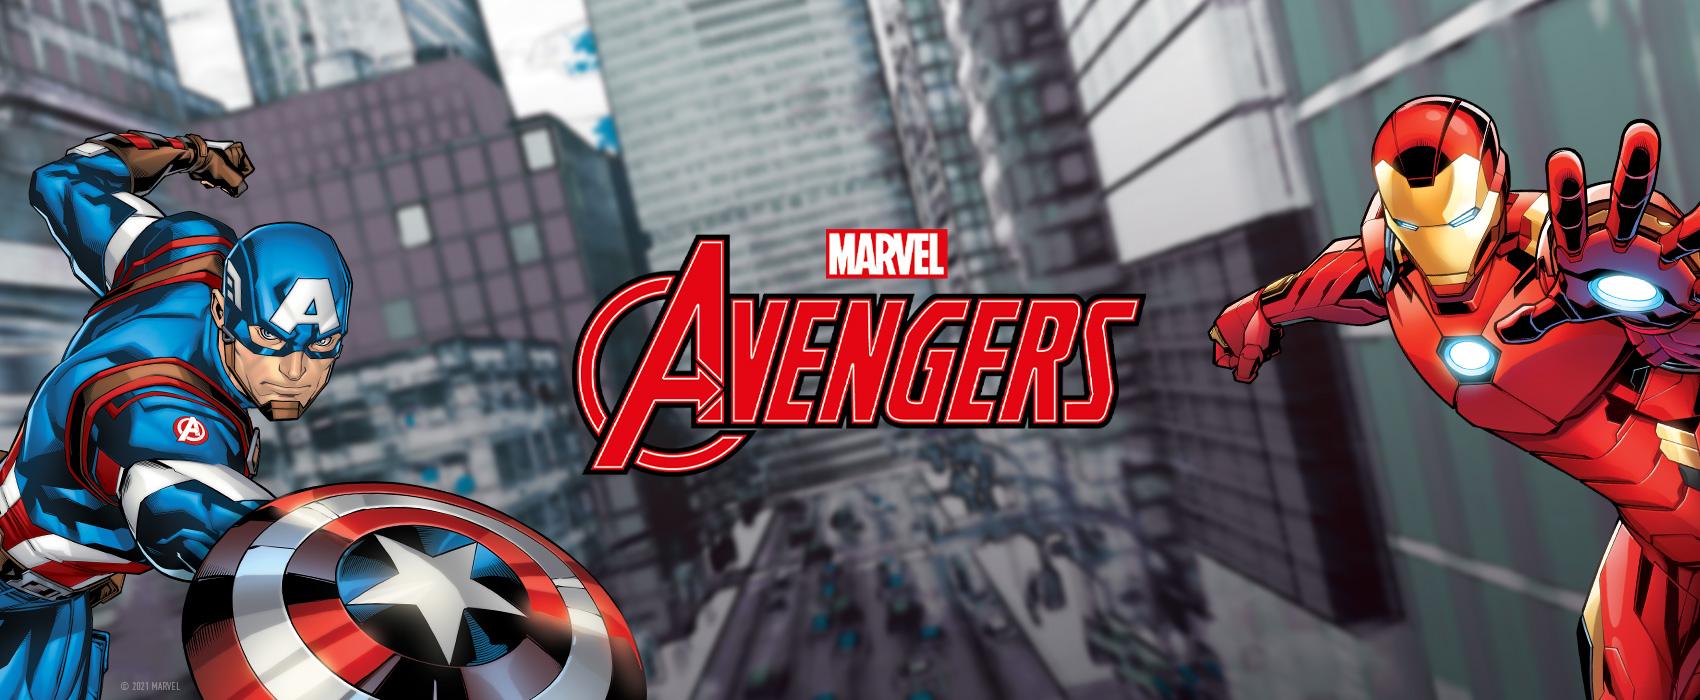 CG2021_Marques_1700x700_Avengers